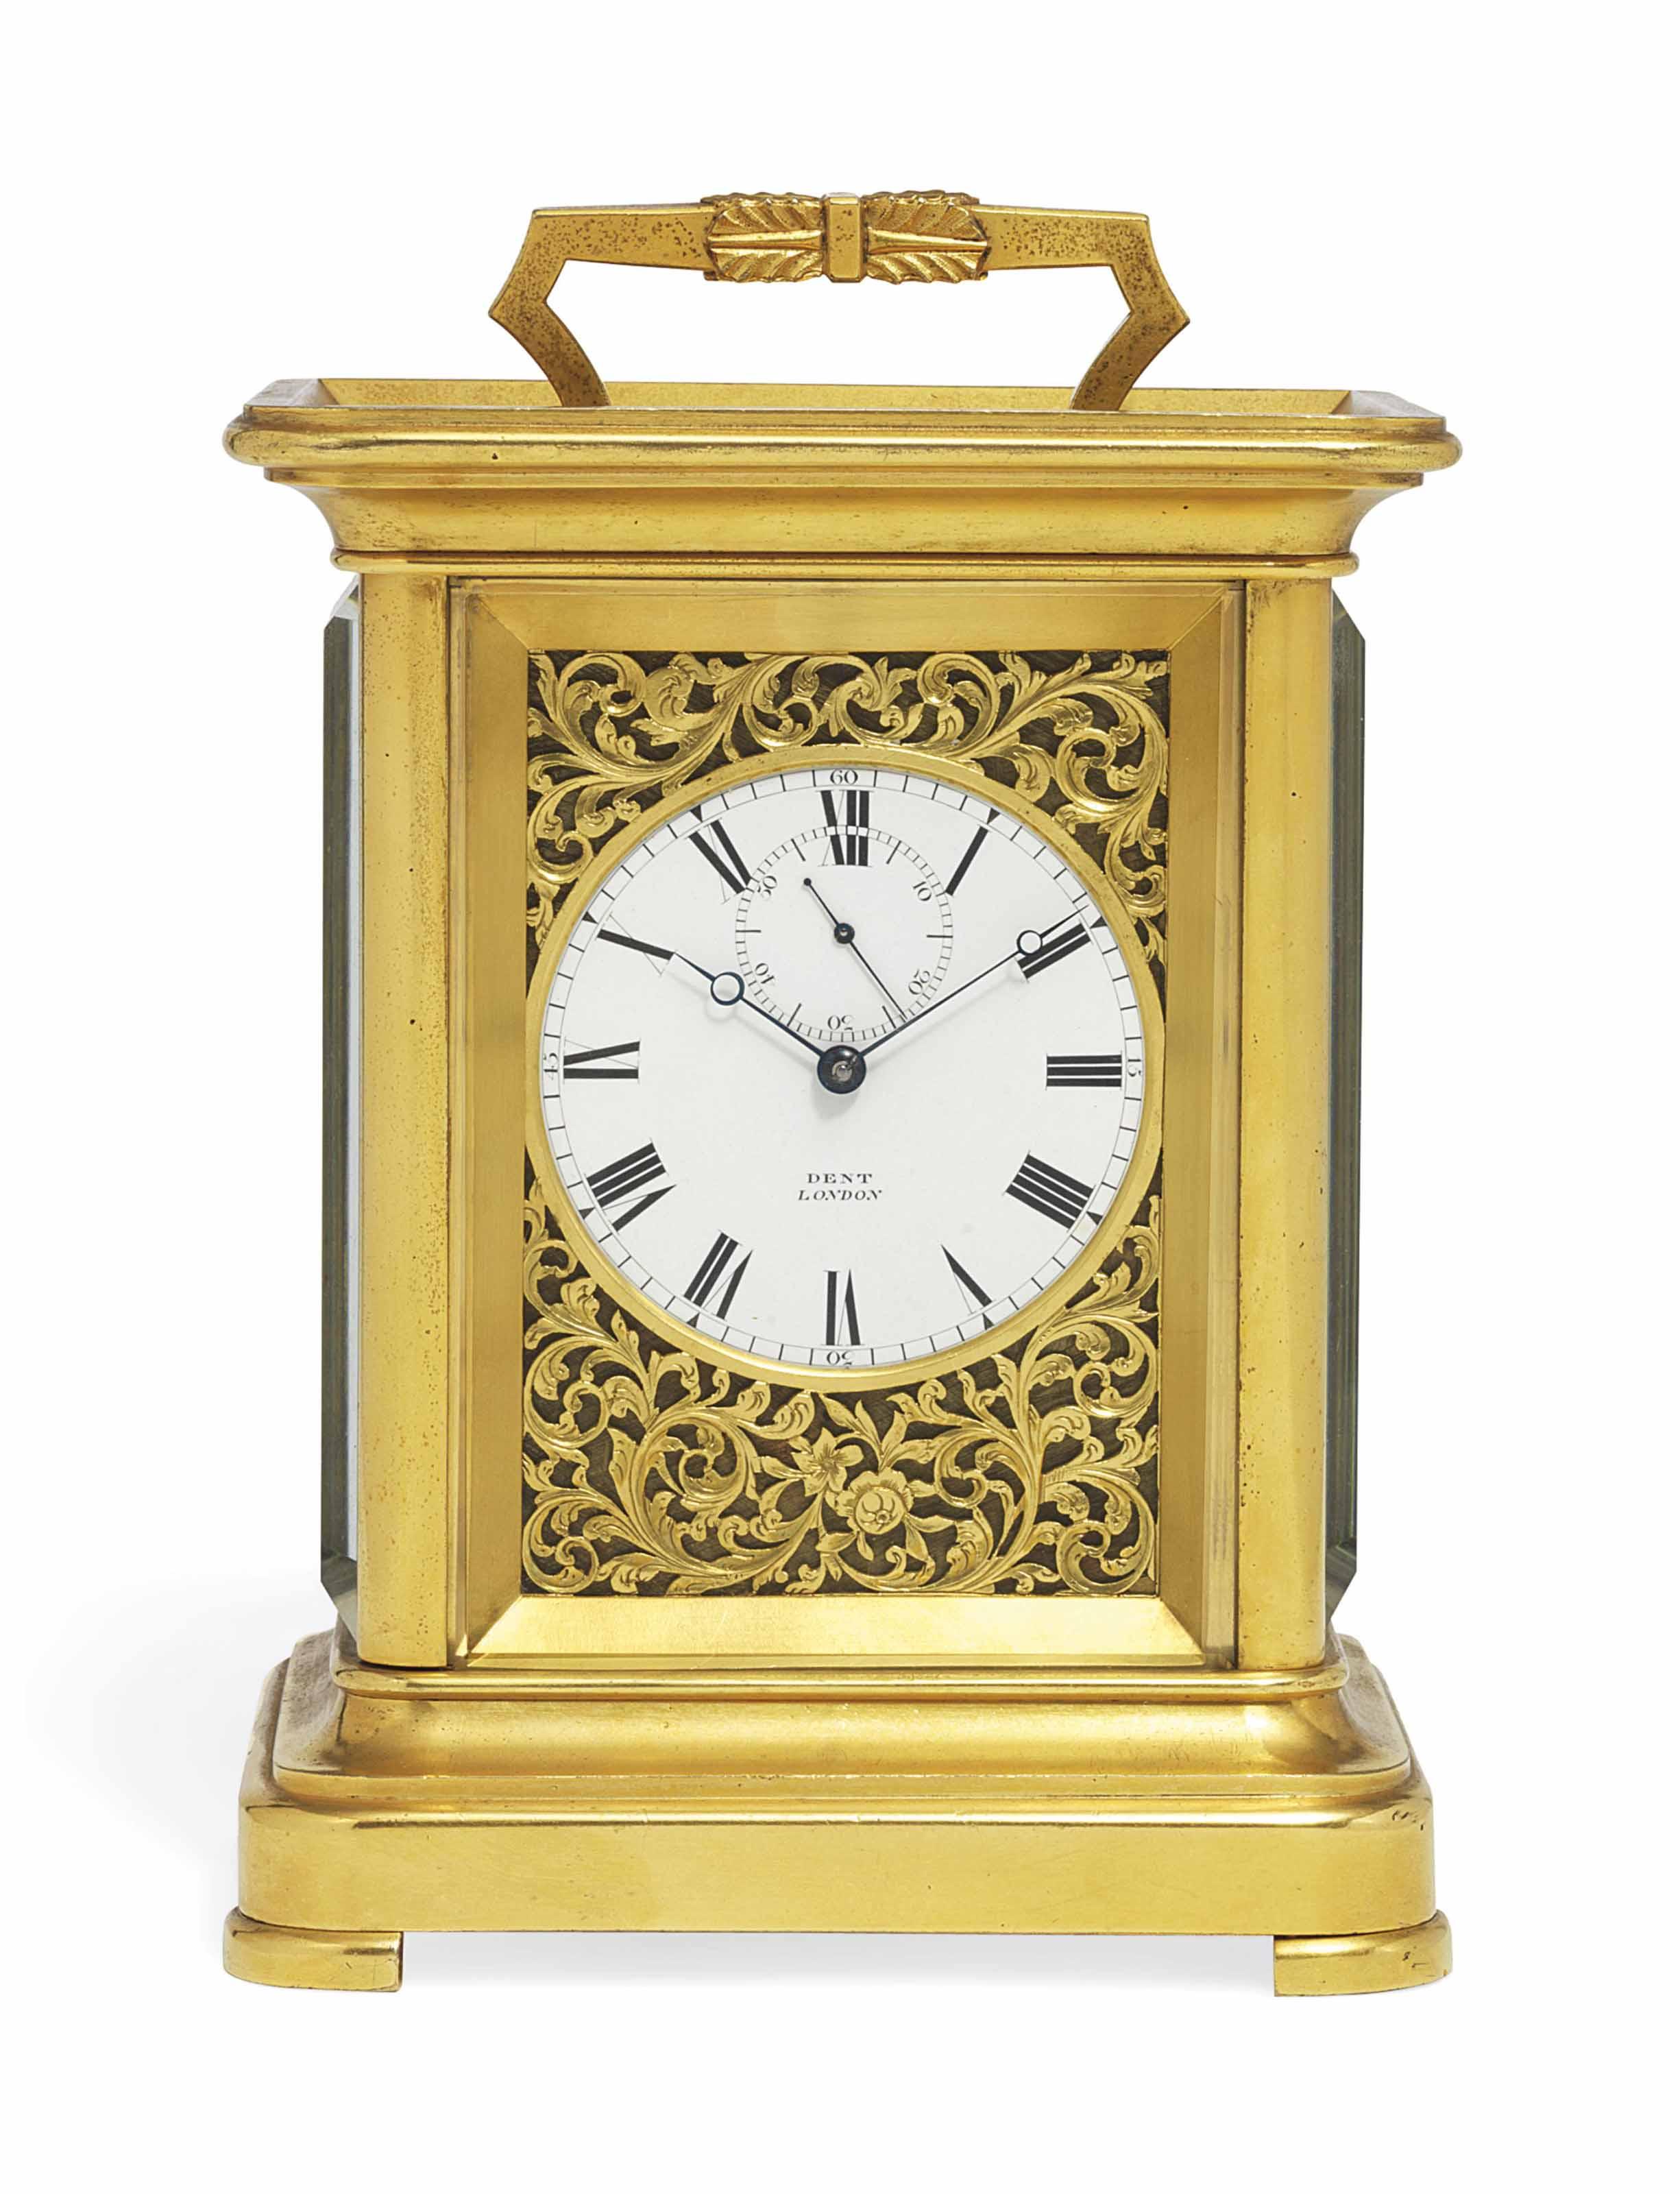 A VICTORIAN GILT-BRASS EIGHT-DAY CHRONOMETER CARRIAGE TIMEPIECE